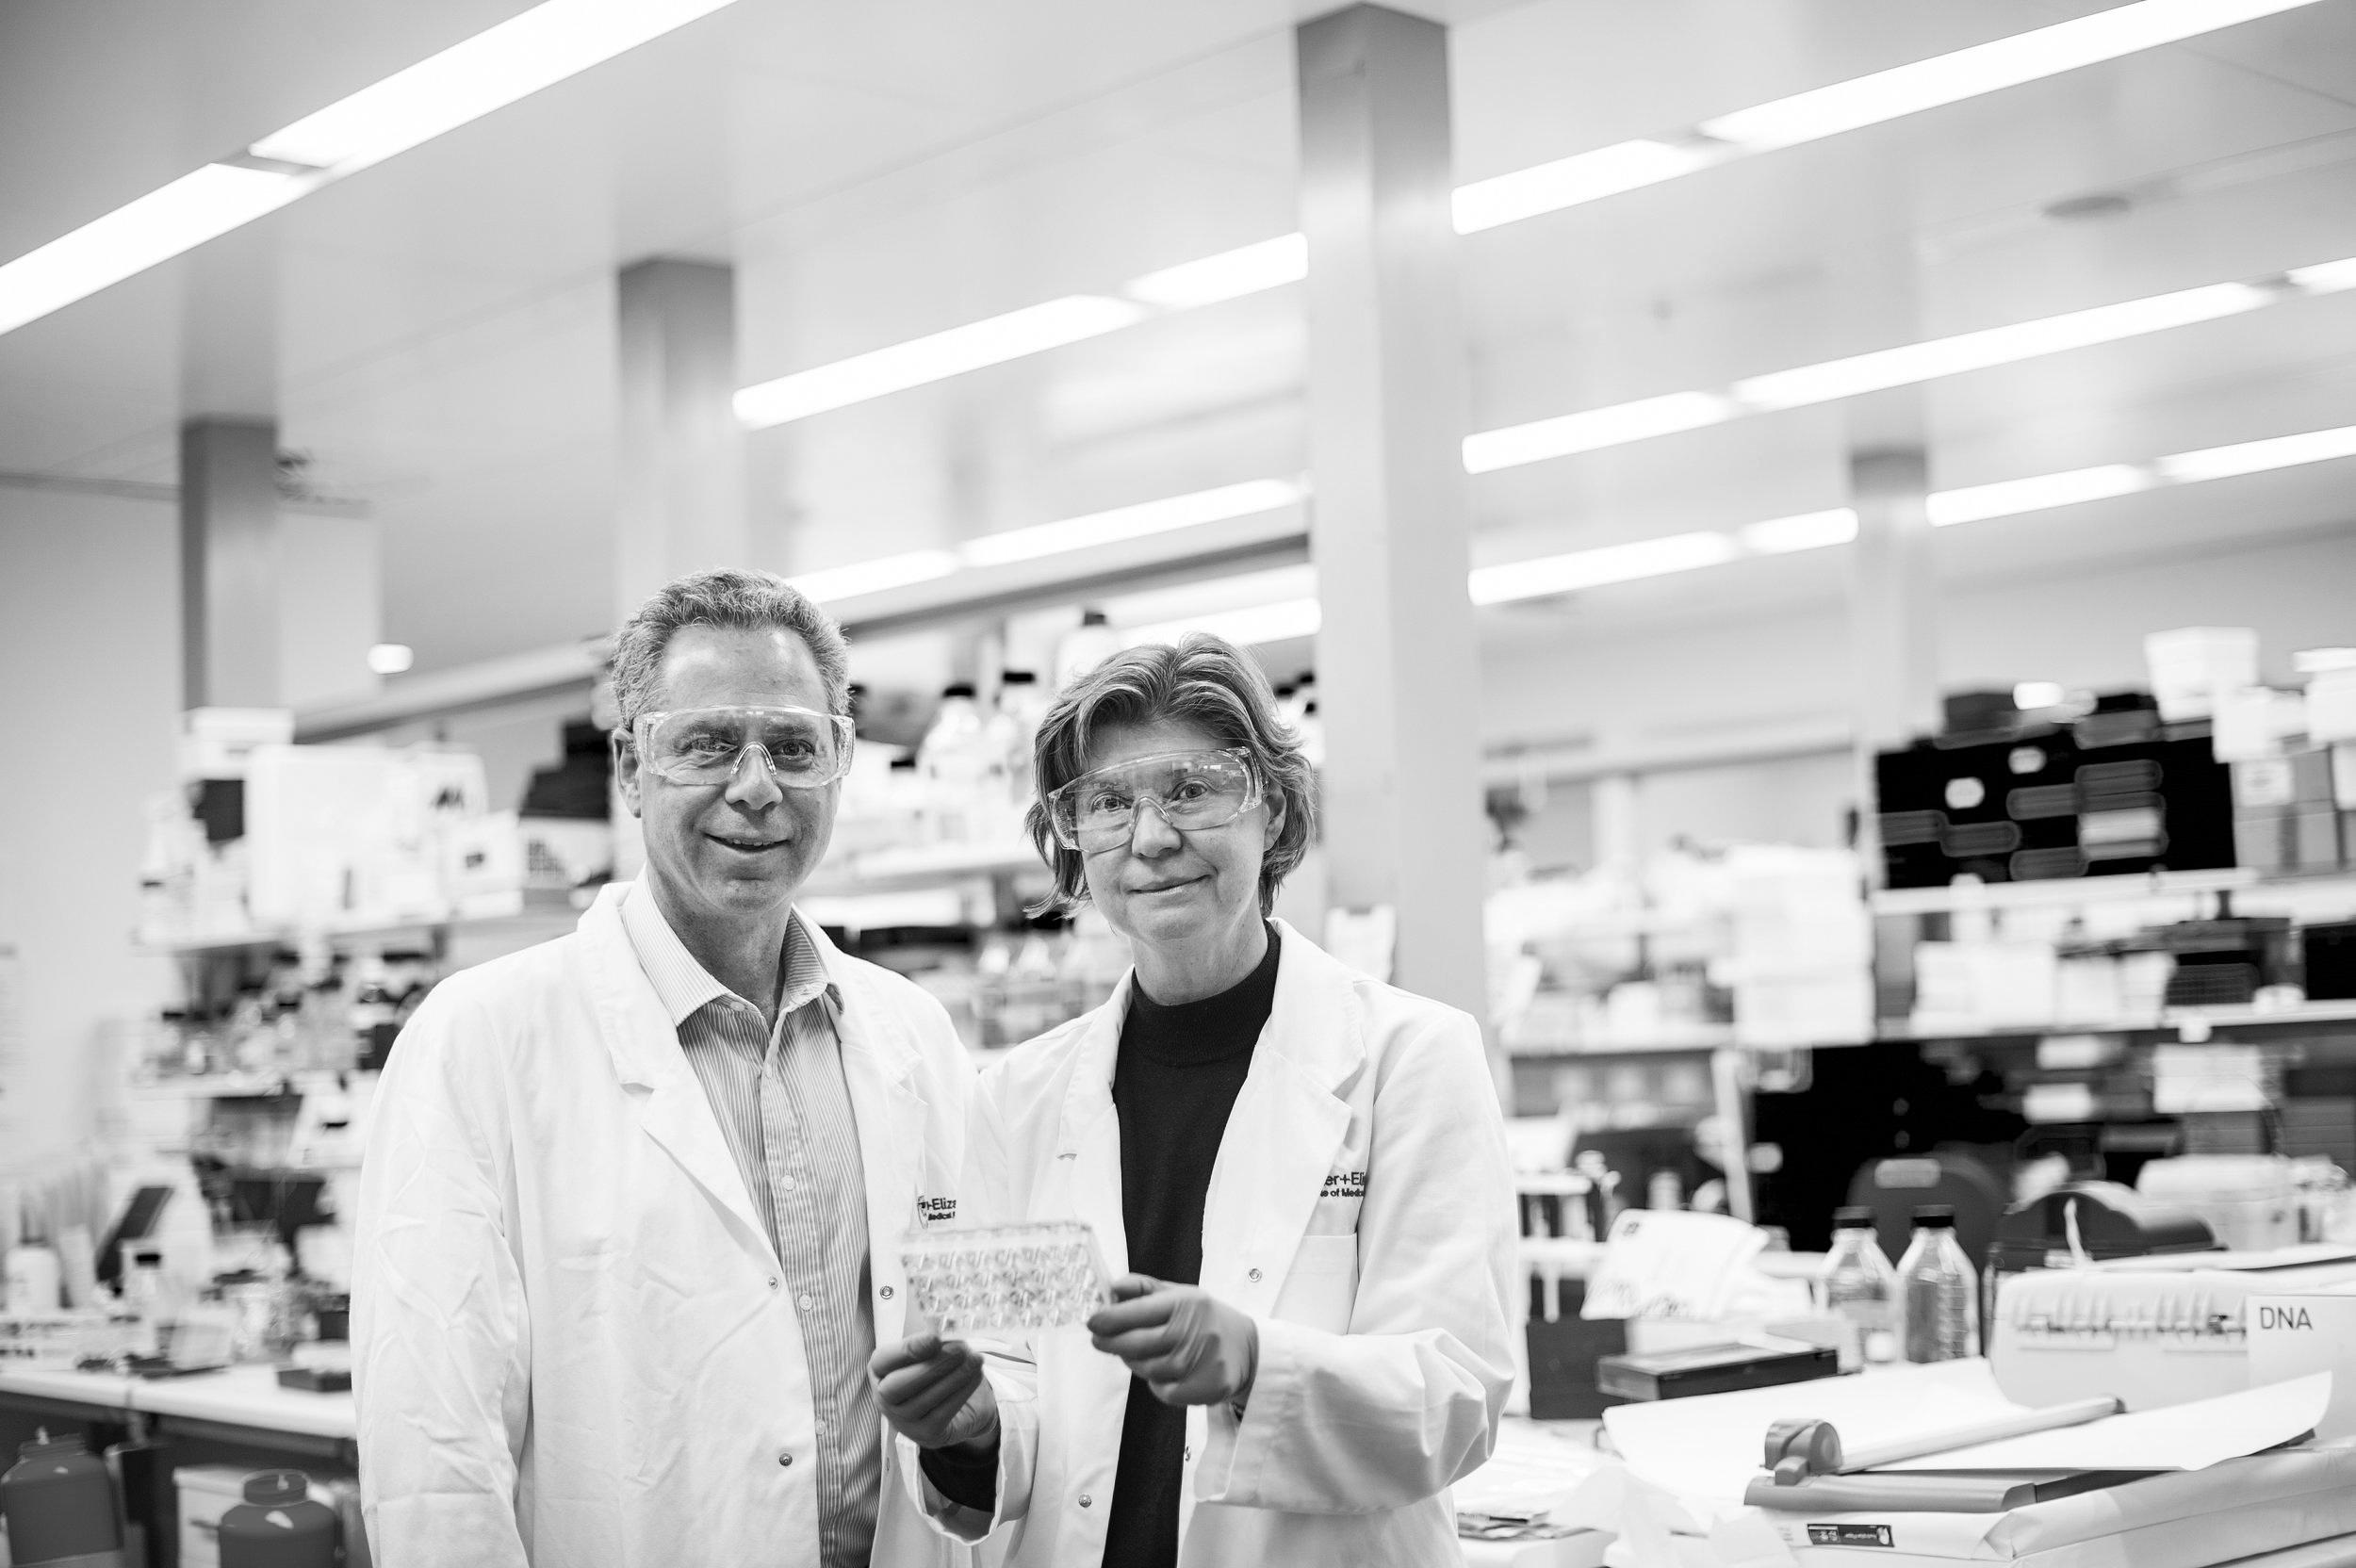 Professor Geoff Lindeman & Professor Jane Visvader